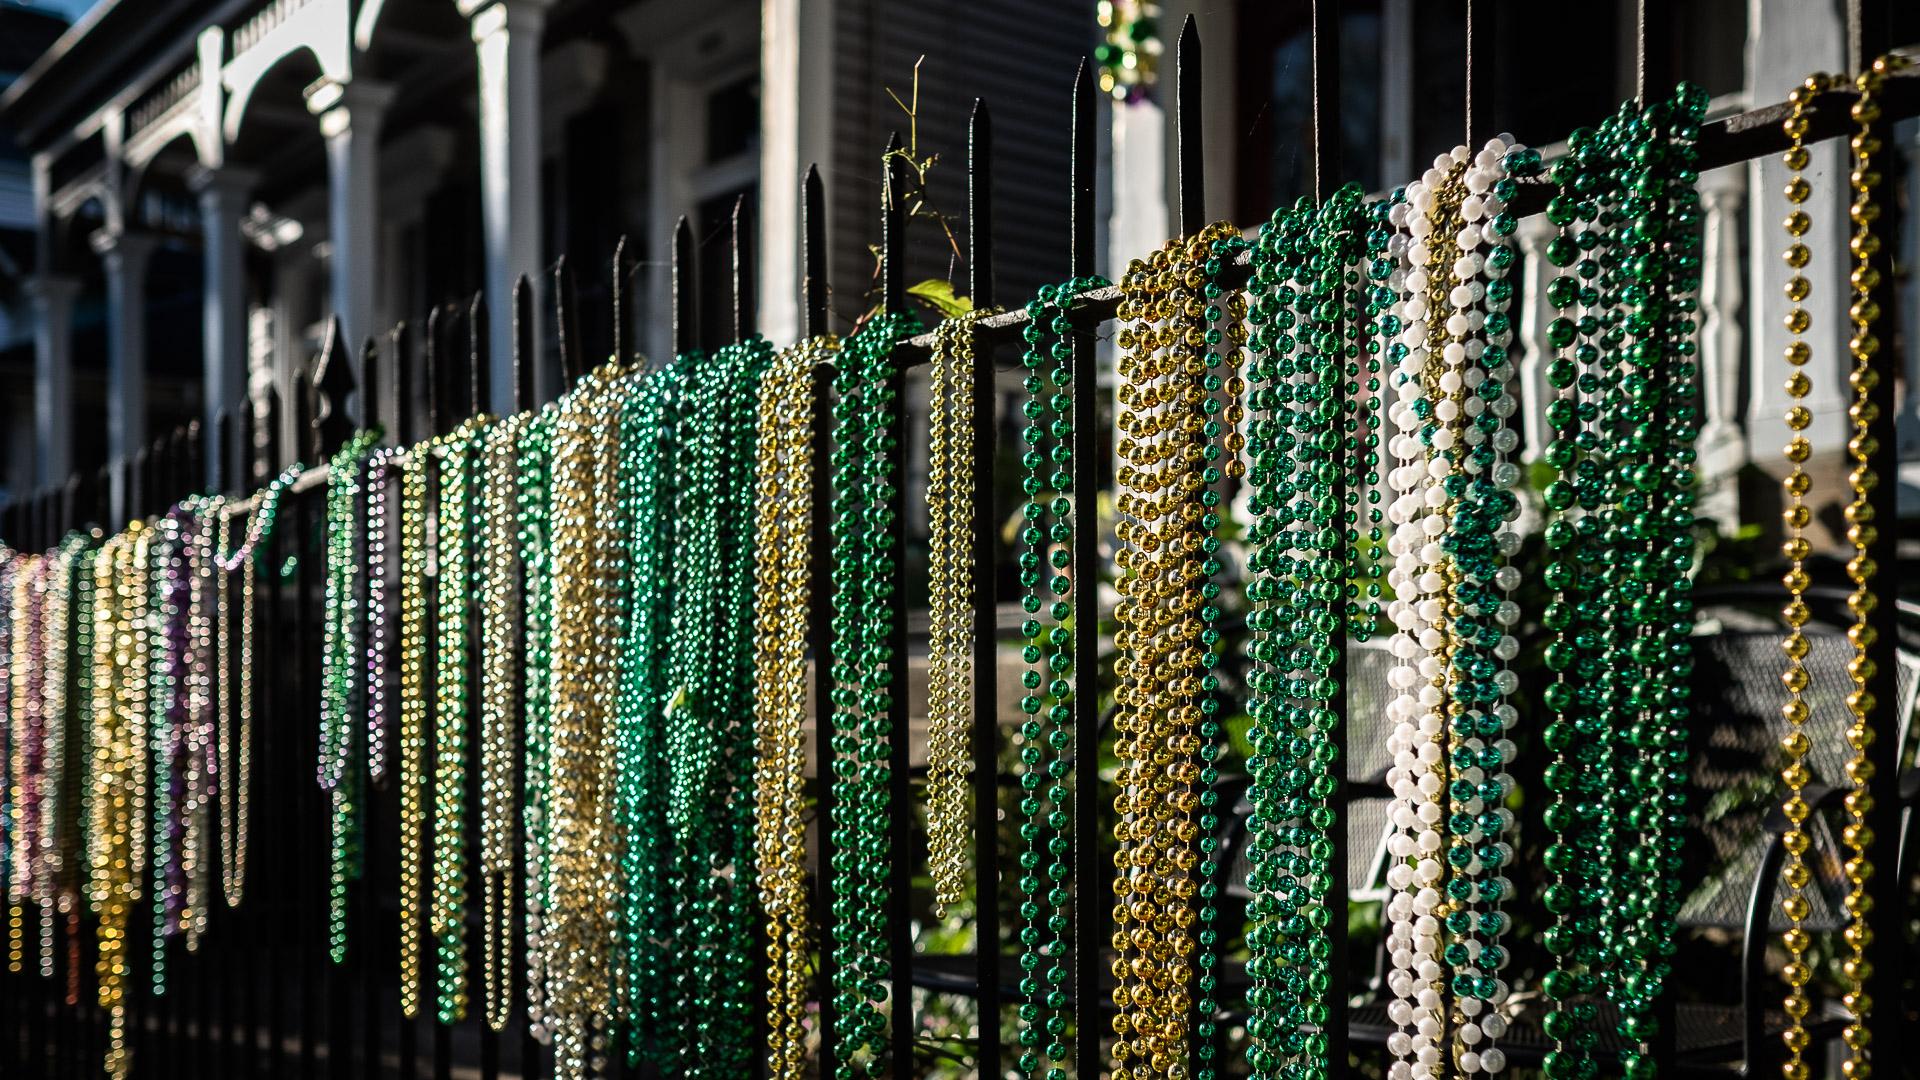 170401-New_Orleans-147-1080.jpg